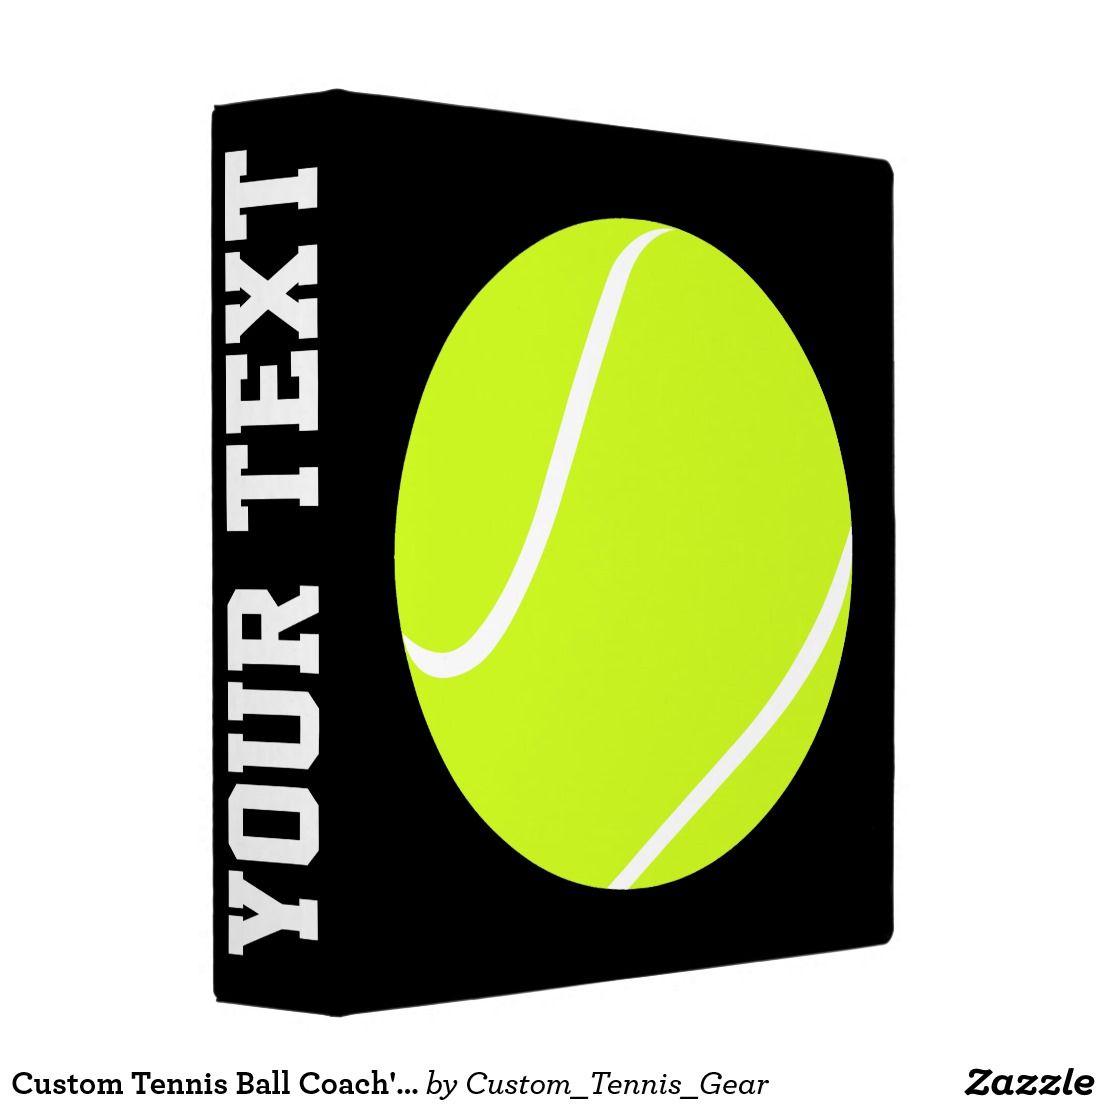 Custom Tennis Ball Coach's Binder